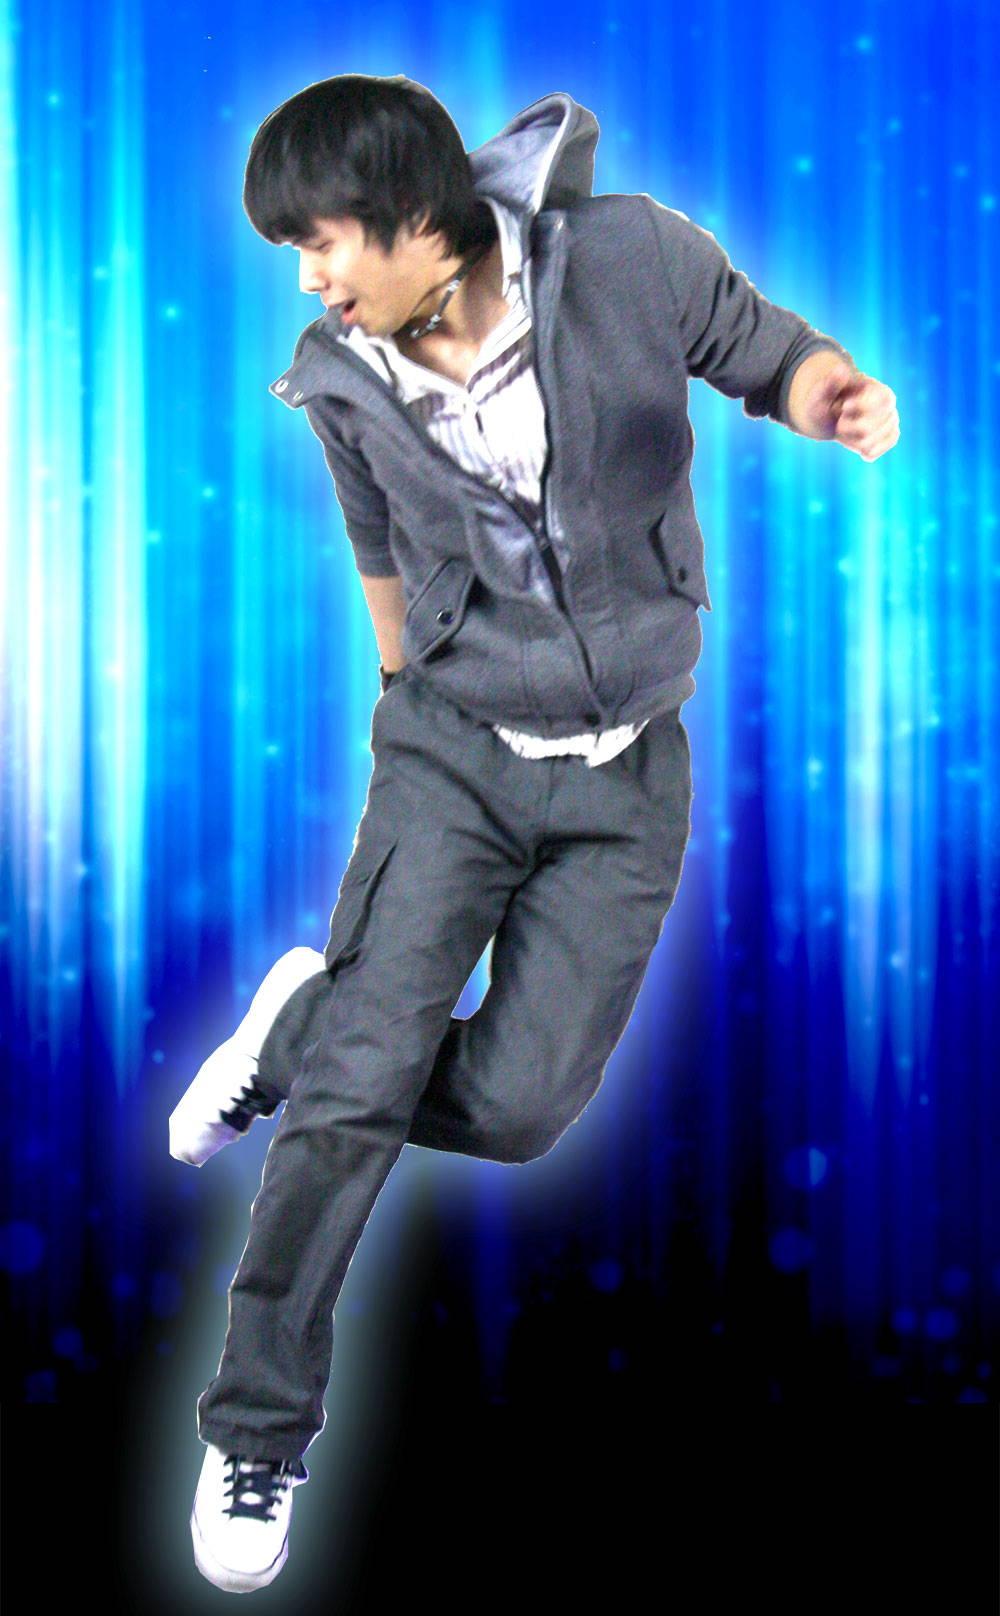 EDM dance instructor